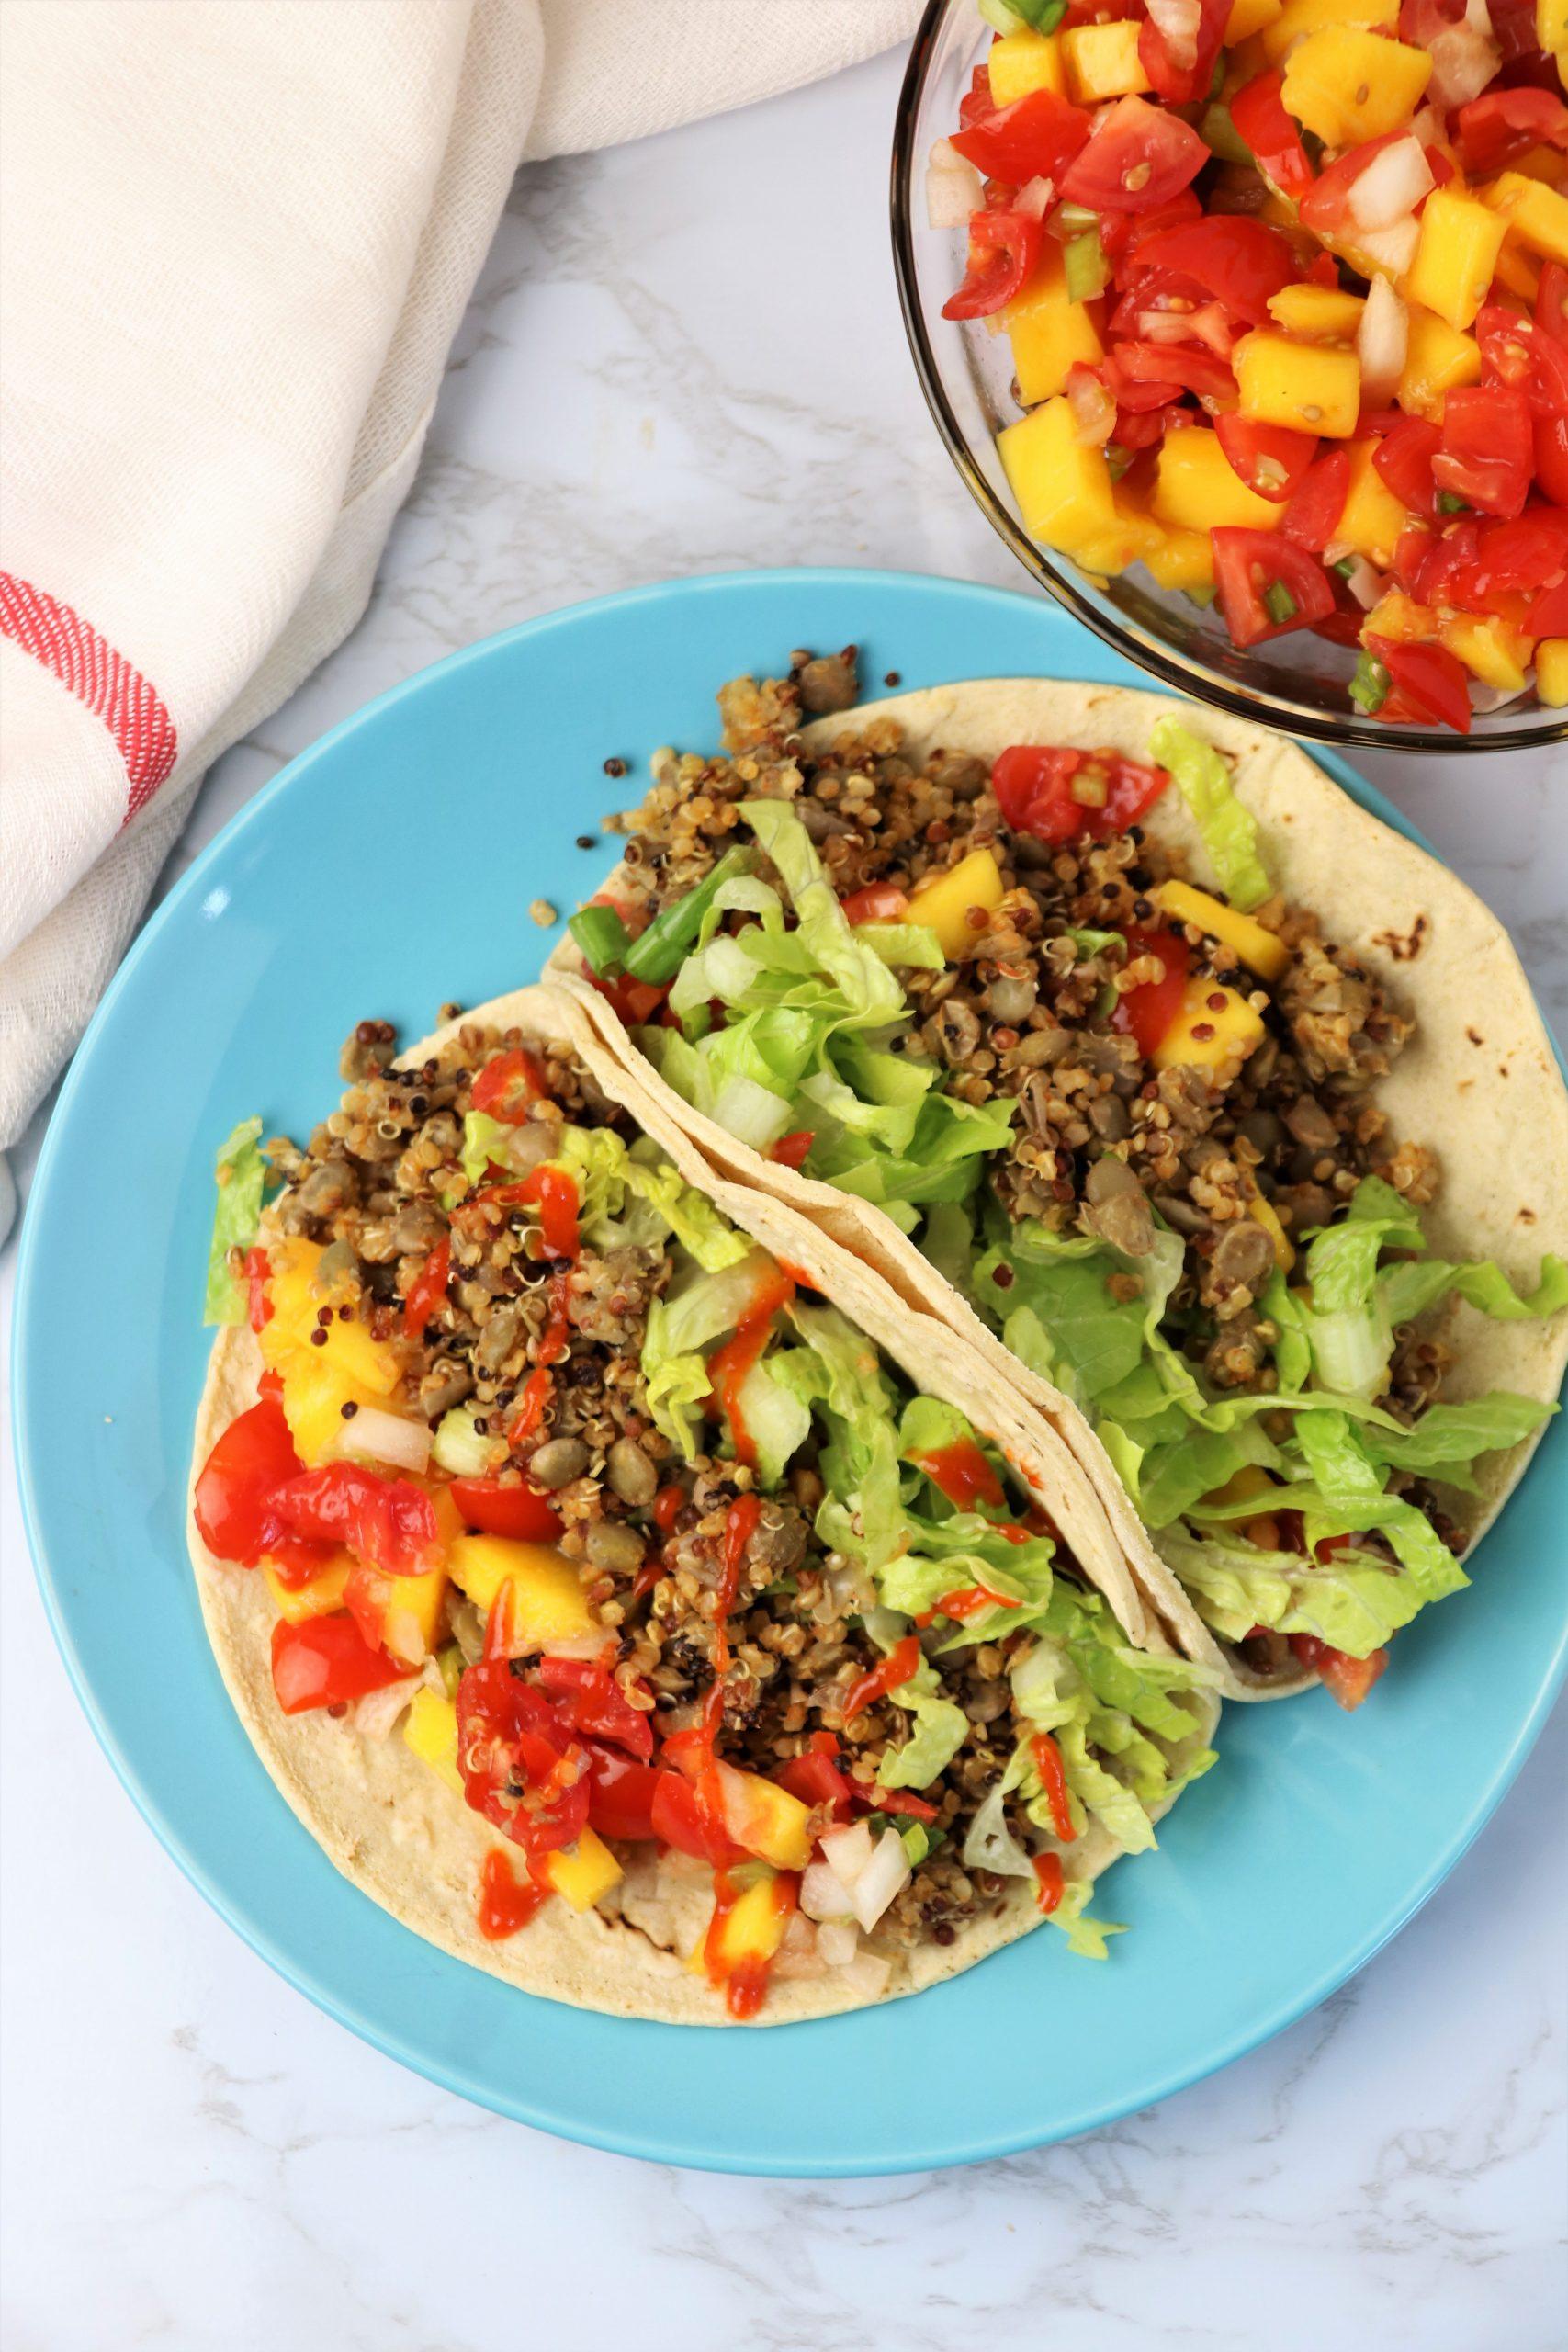 easy vegan lentil tacos with mango salsa